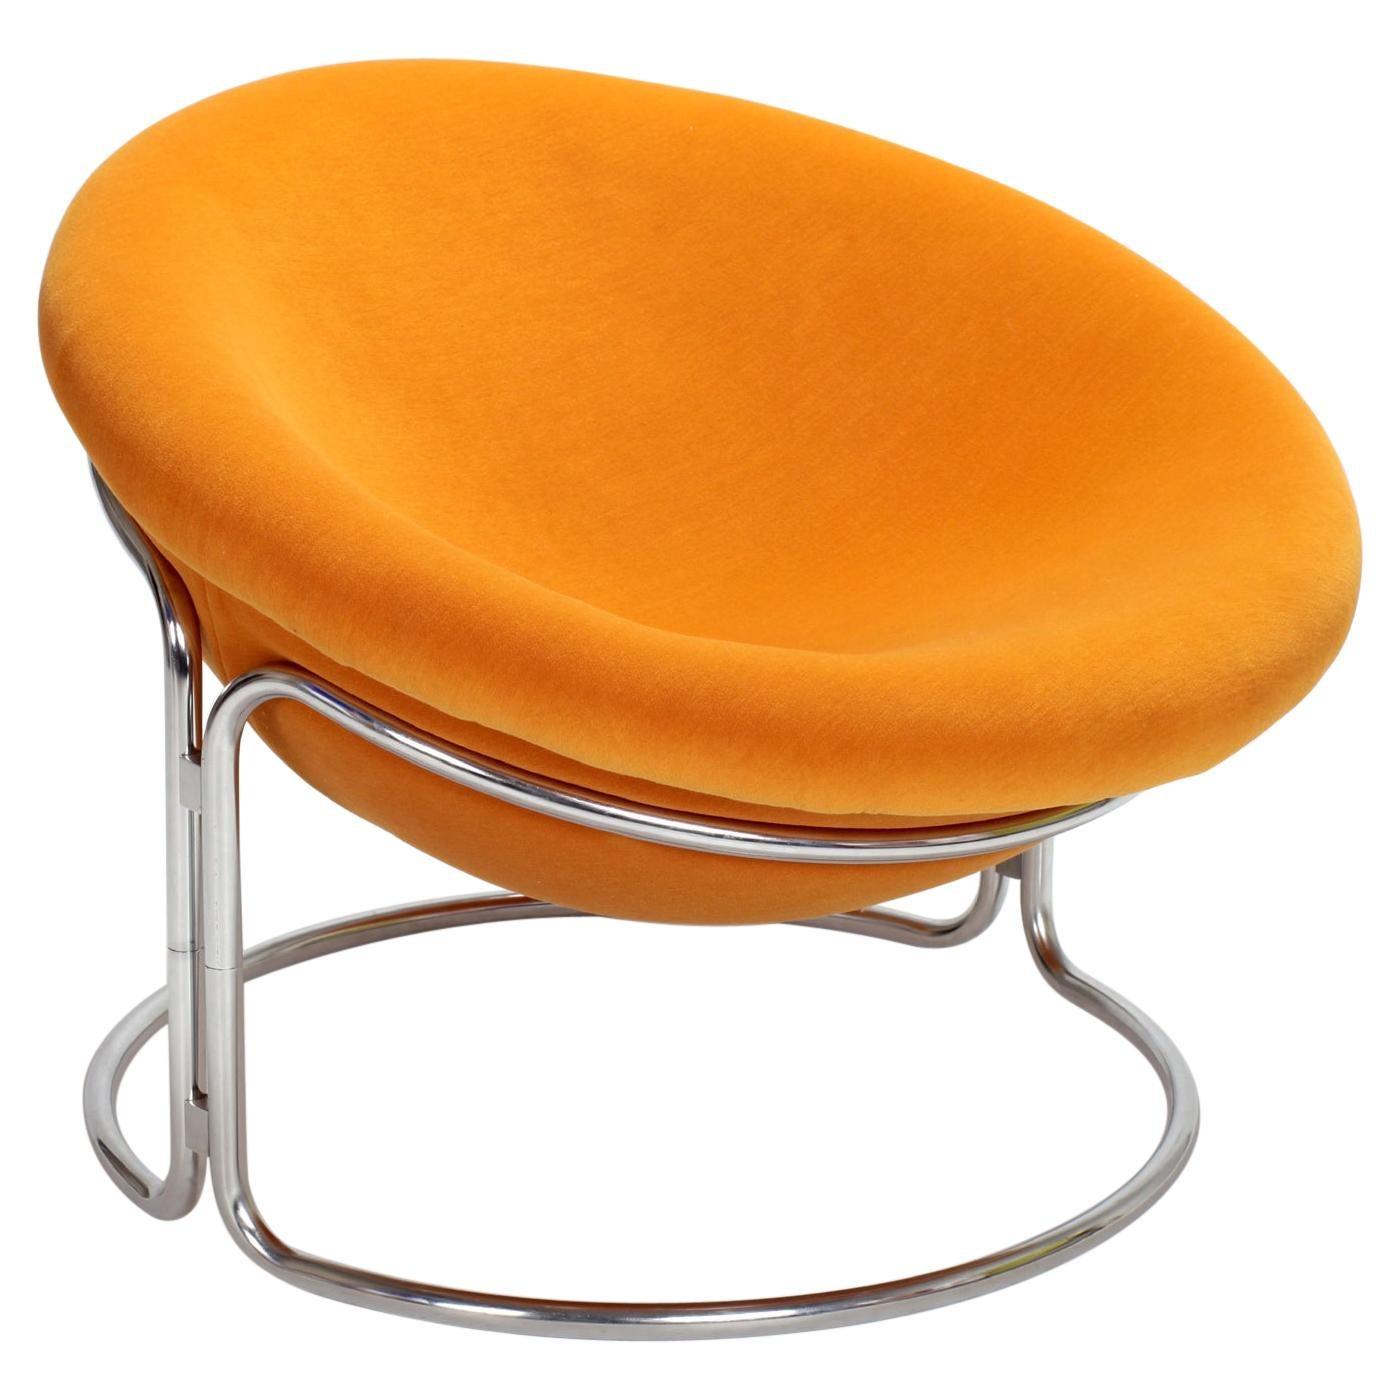 Luigi Colani Space Age Lounge Chair, 1970